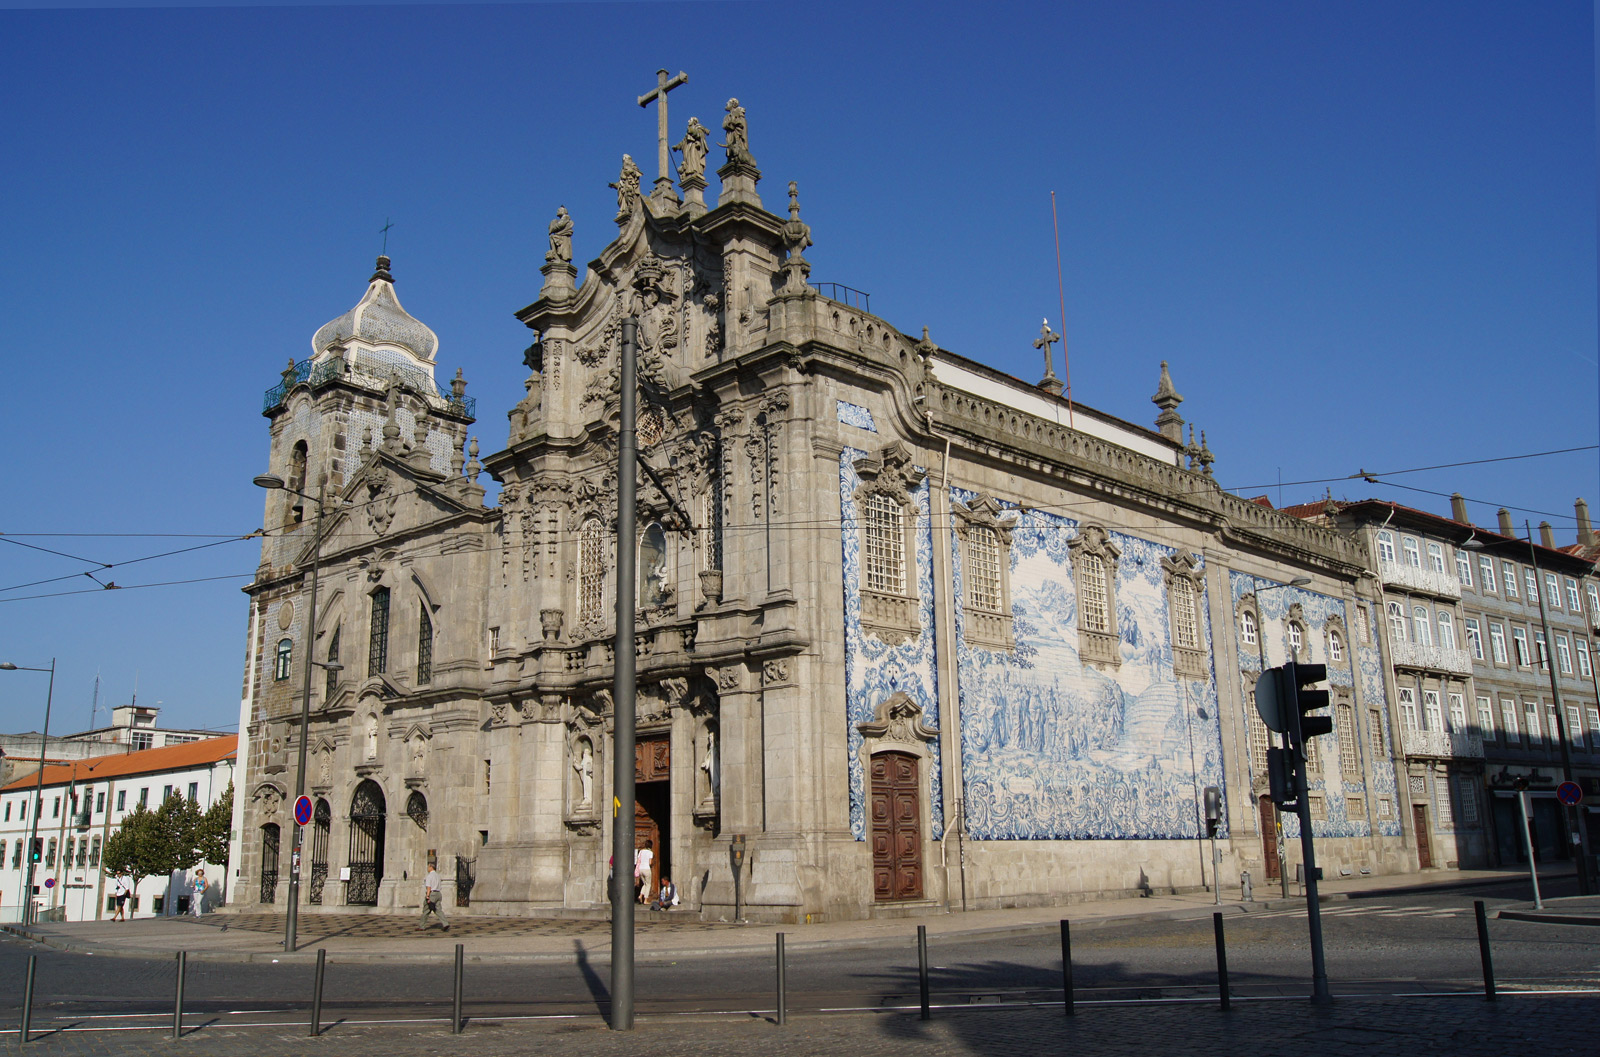 Igreja do carmo azulejos portugal azulejo pinterest for Casa dos azulejos lisboa